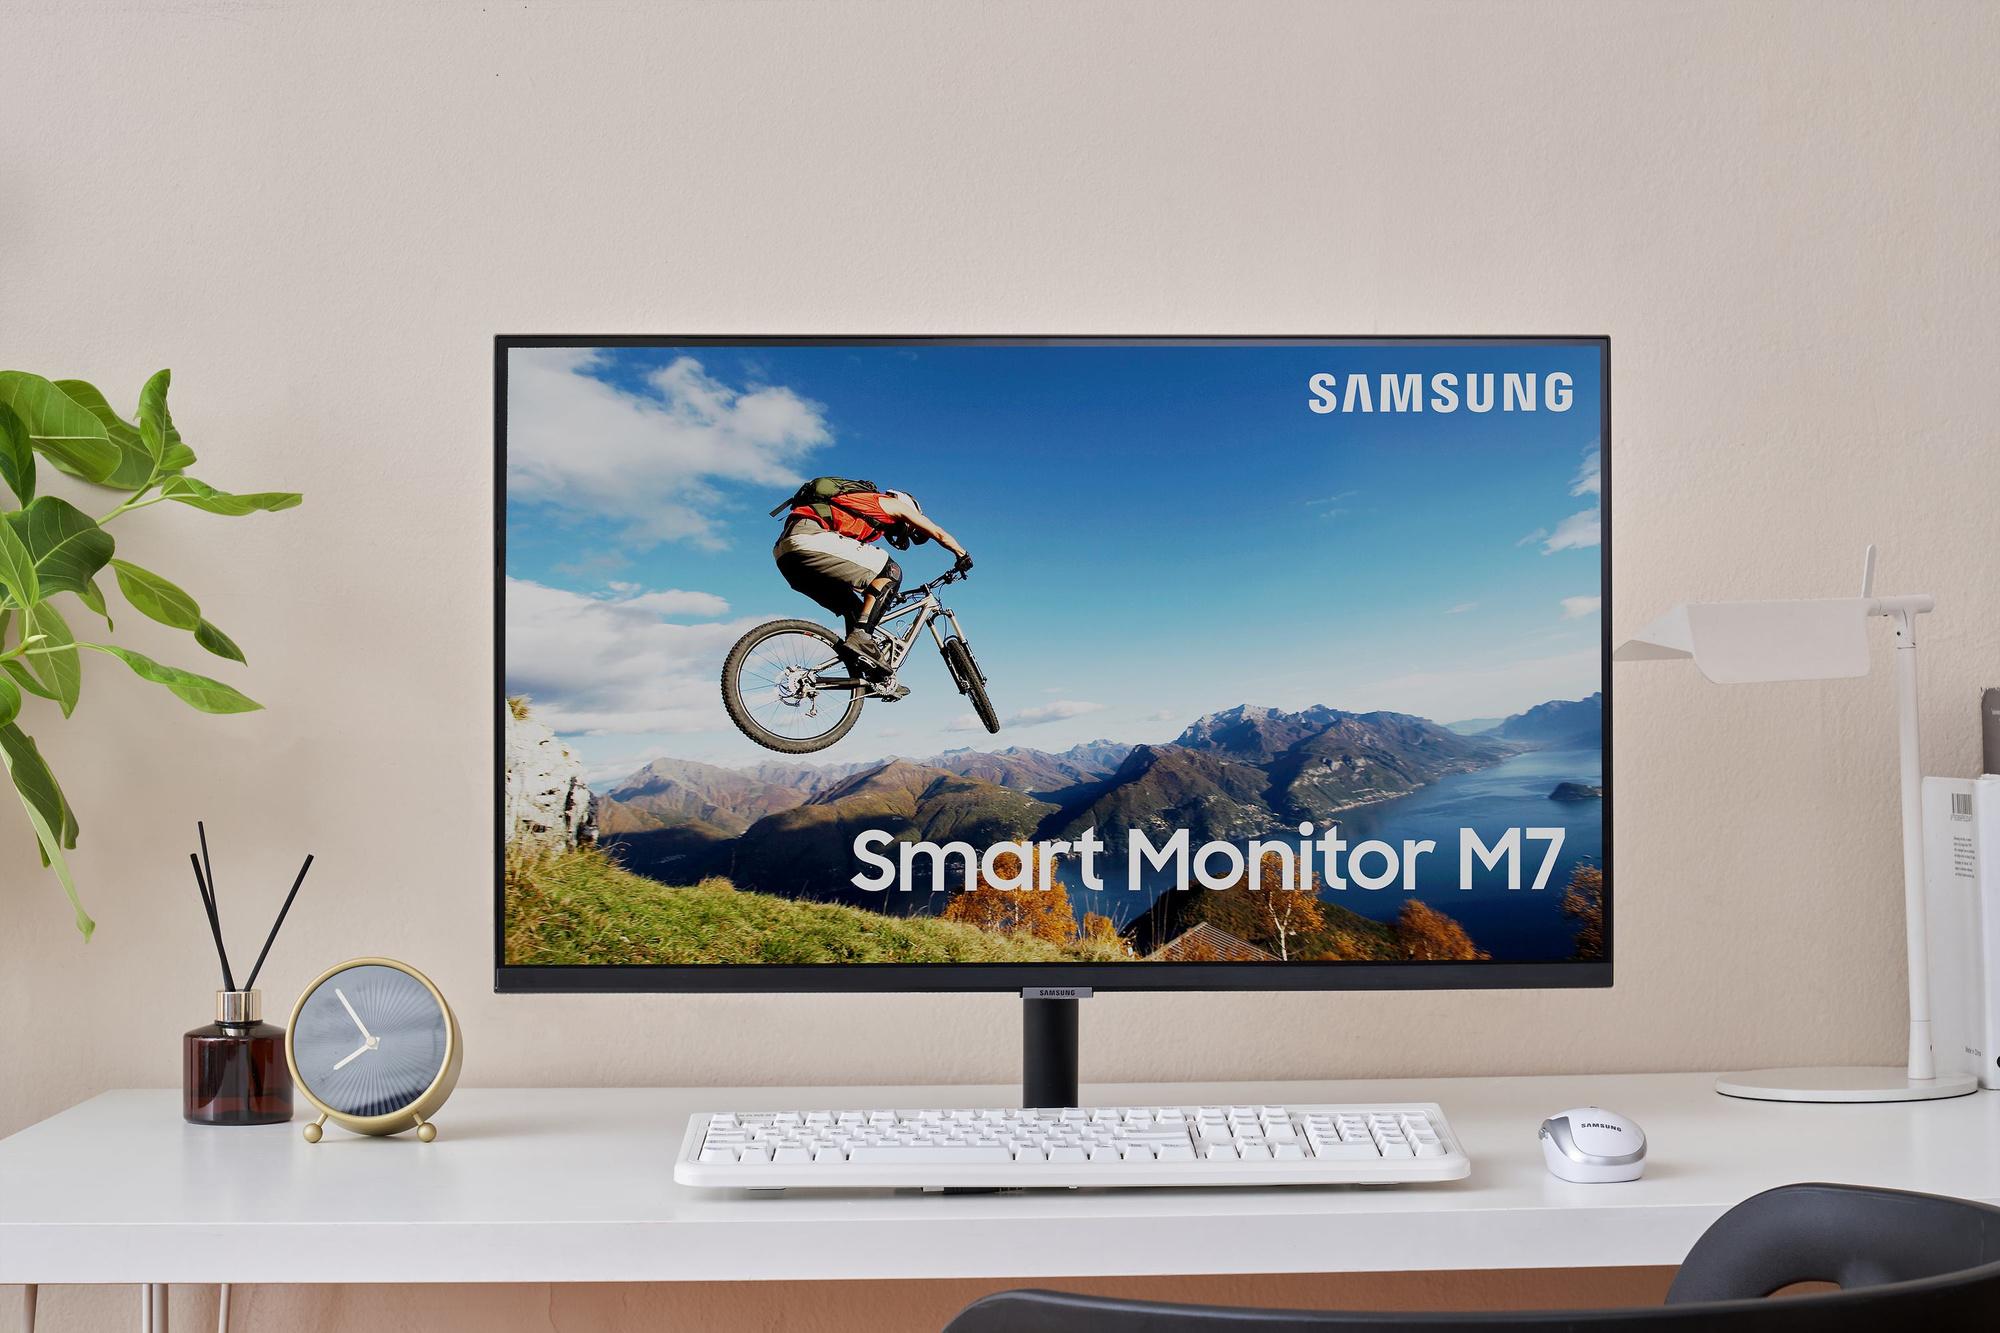 Samsung Smart Monitor M7, Samsung